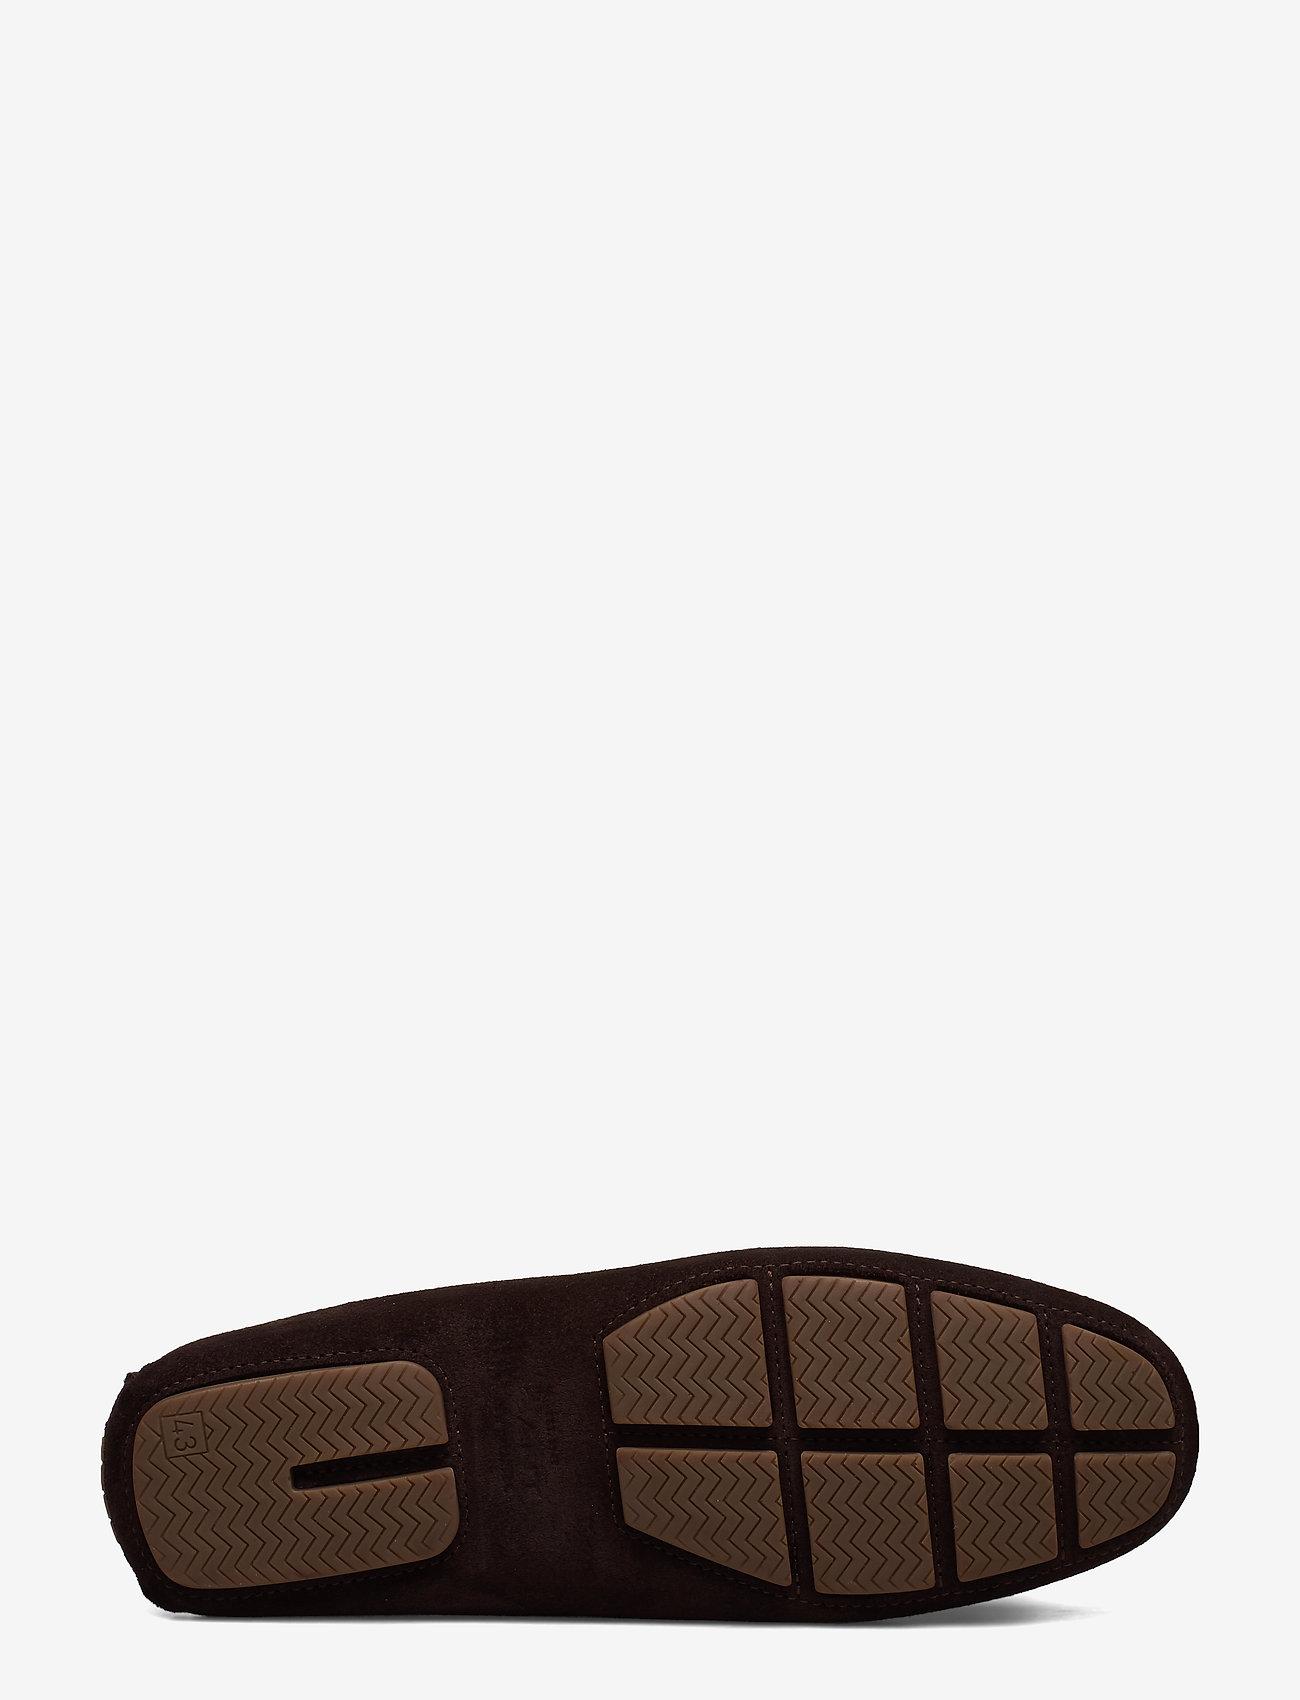 Nicehill Moccasin (Dark Brown) - GANT